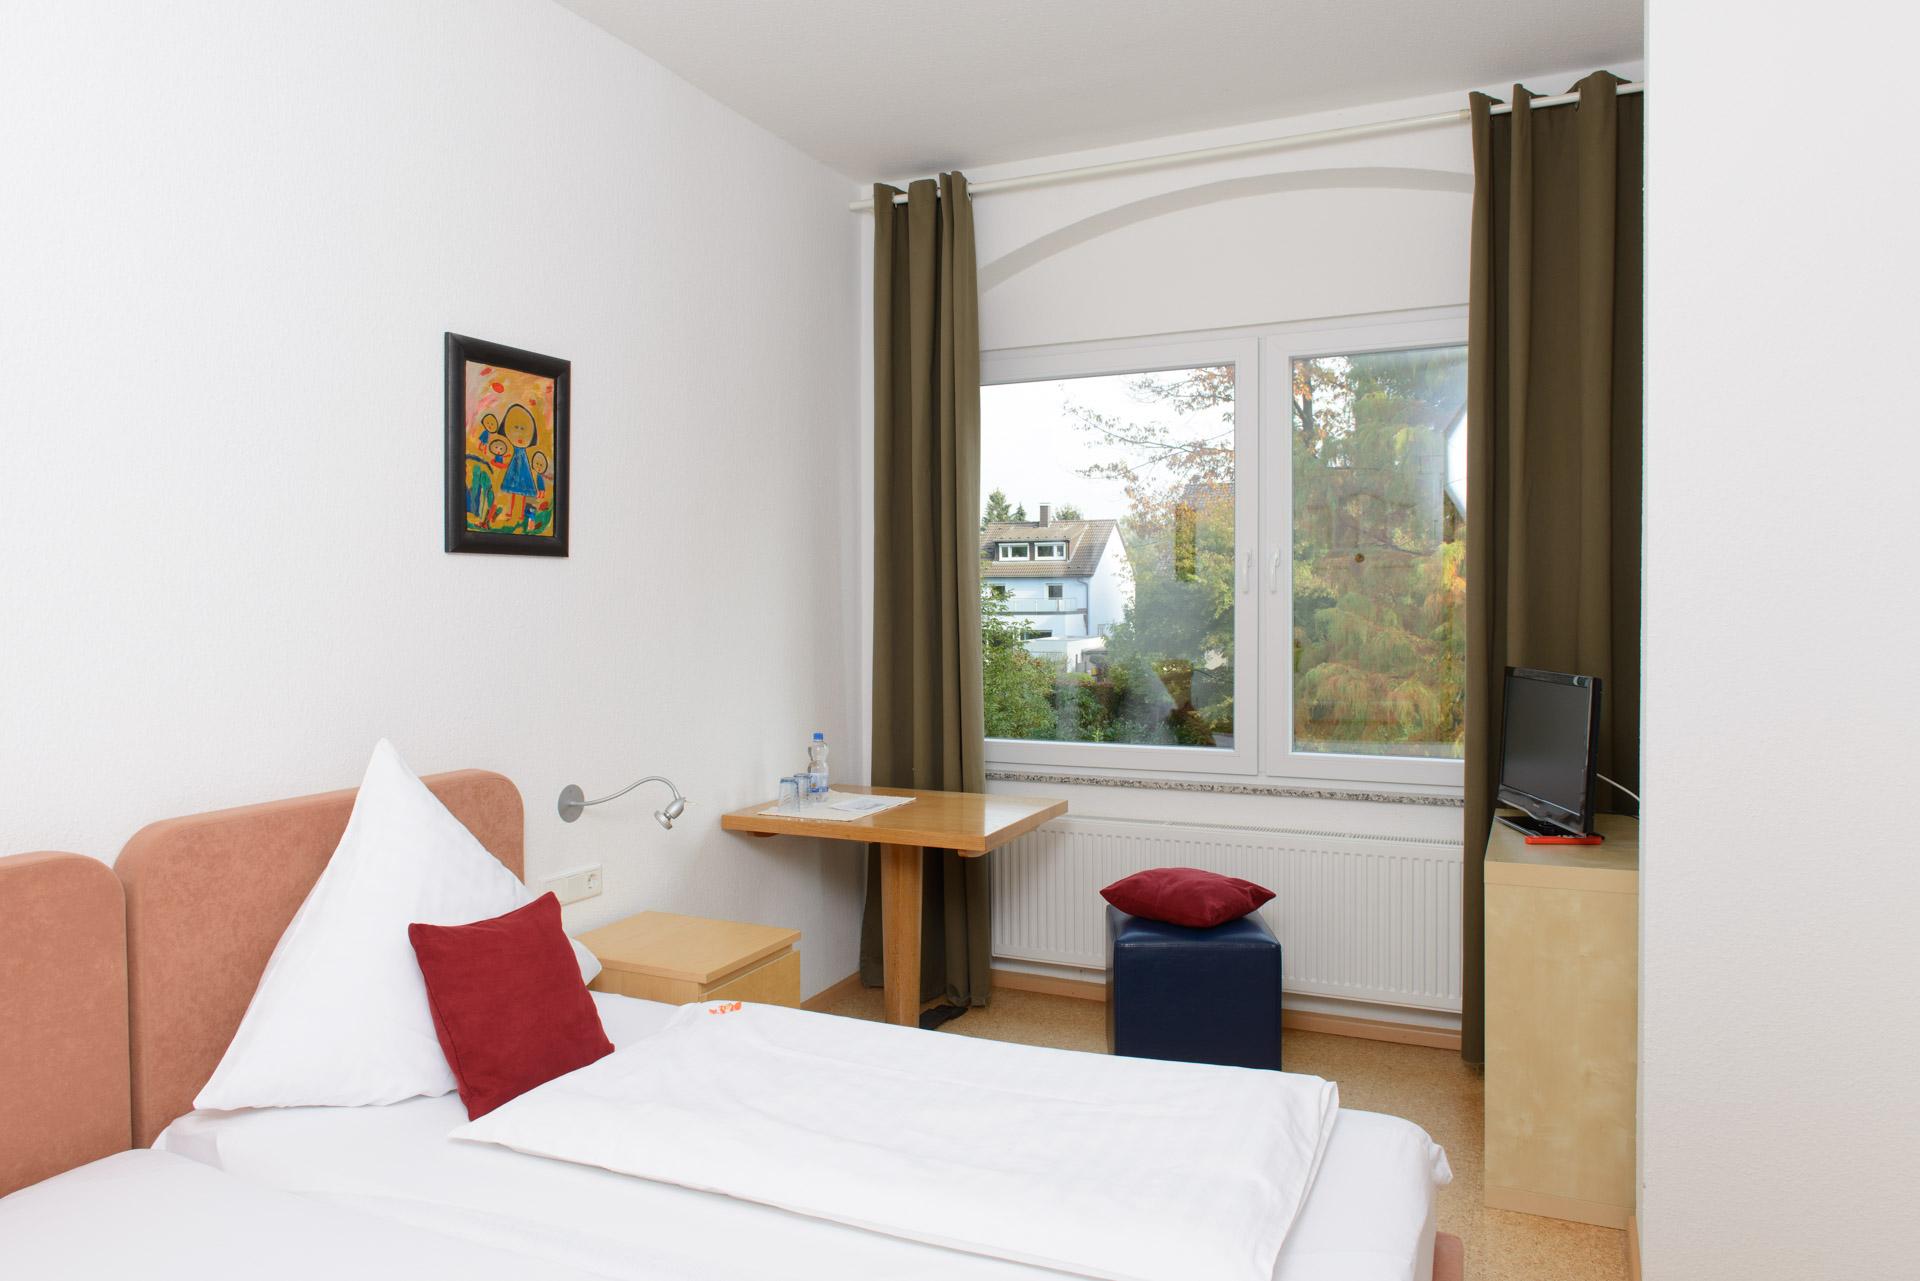 Blick in ein Zimmer Hotel INNsel26 in Oberhausen